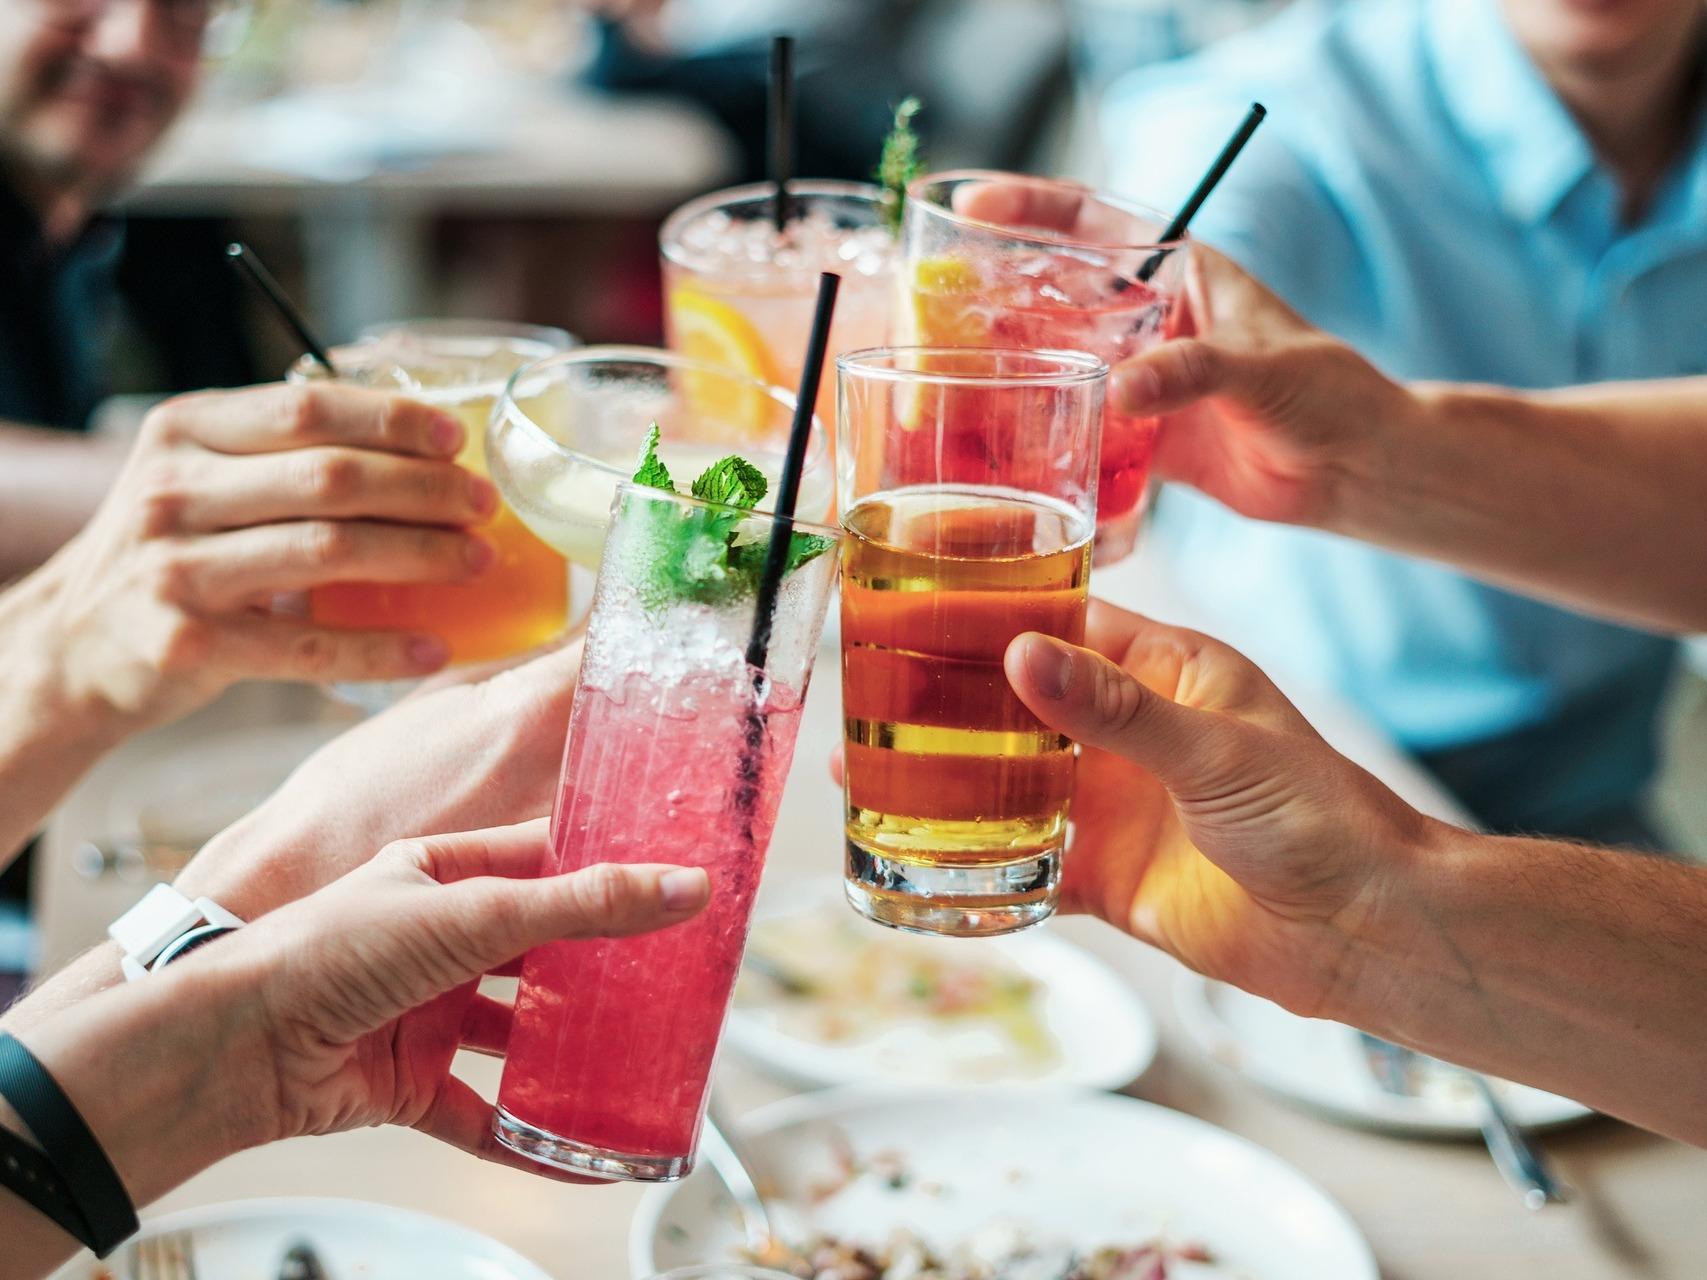 beverage industry statistics